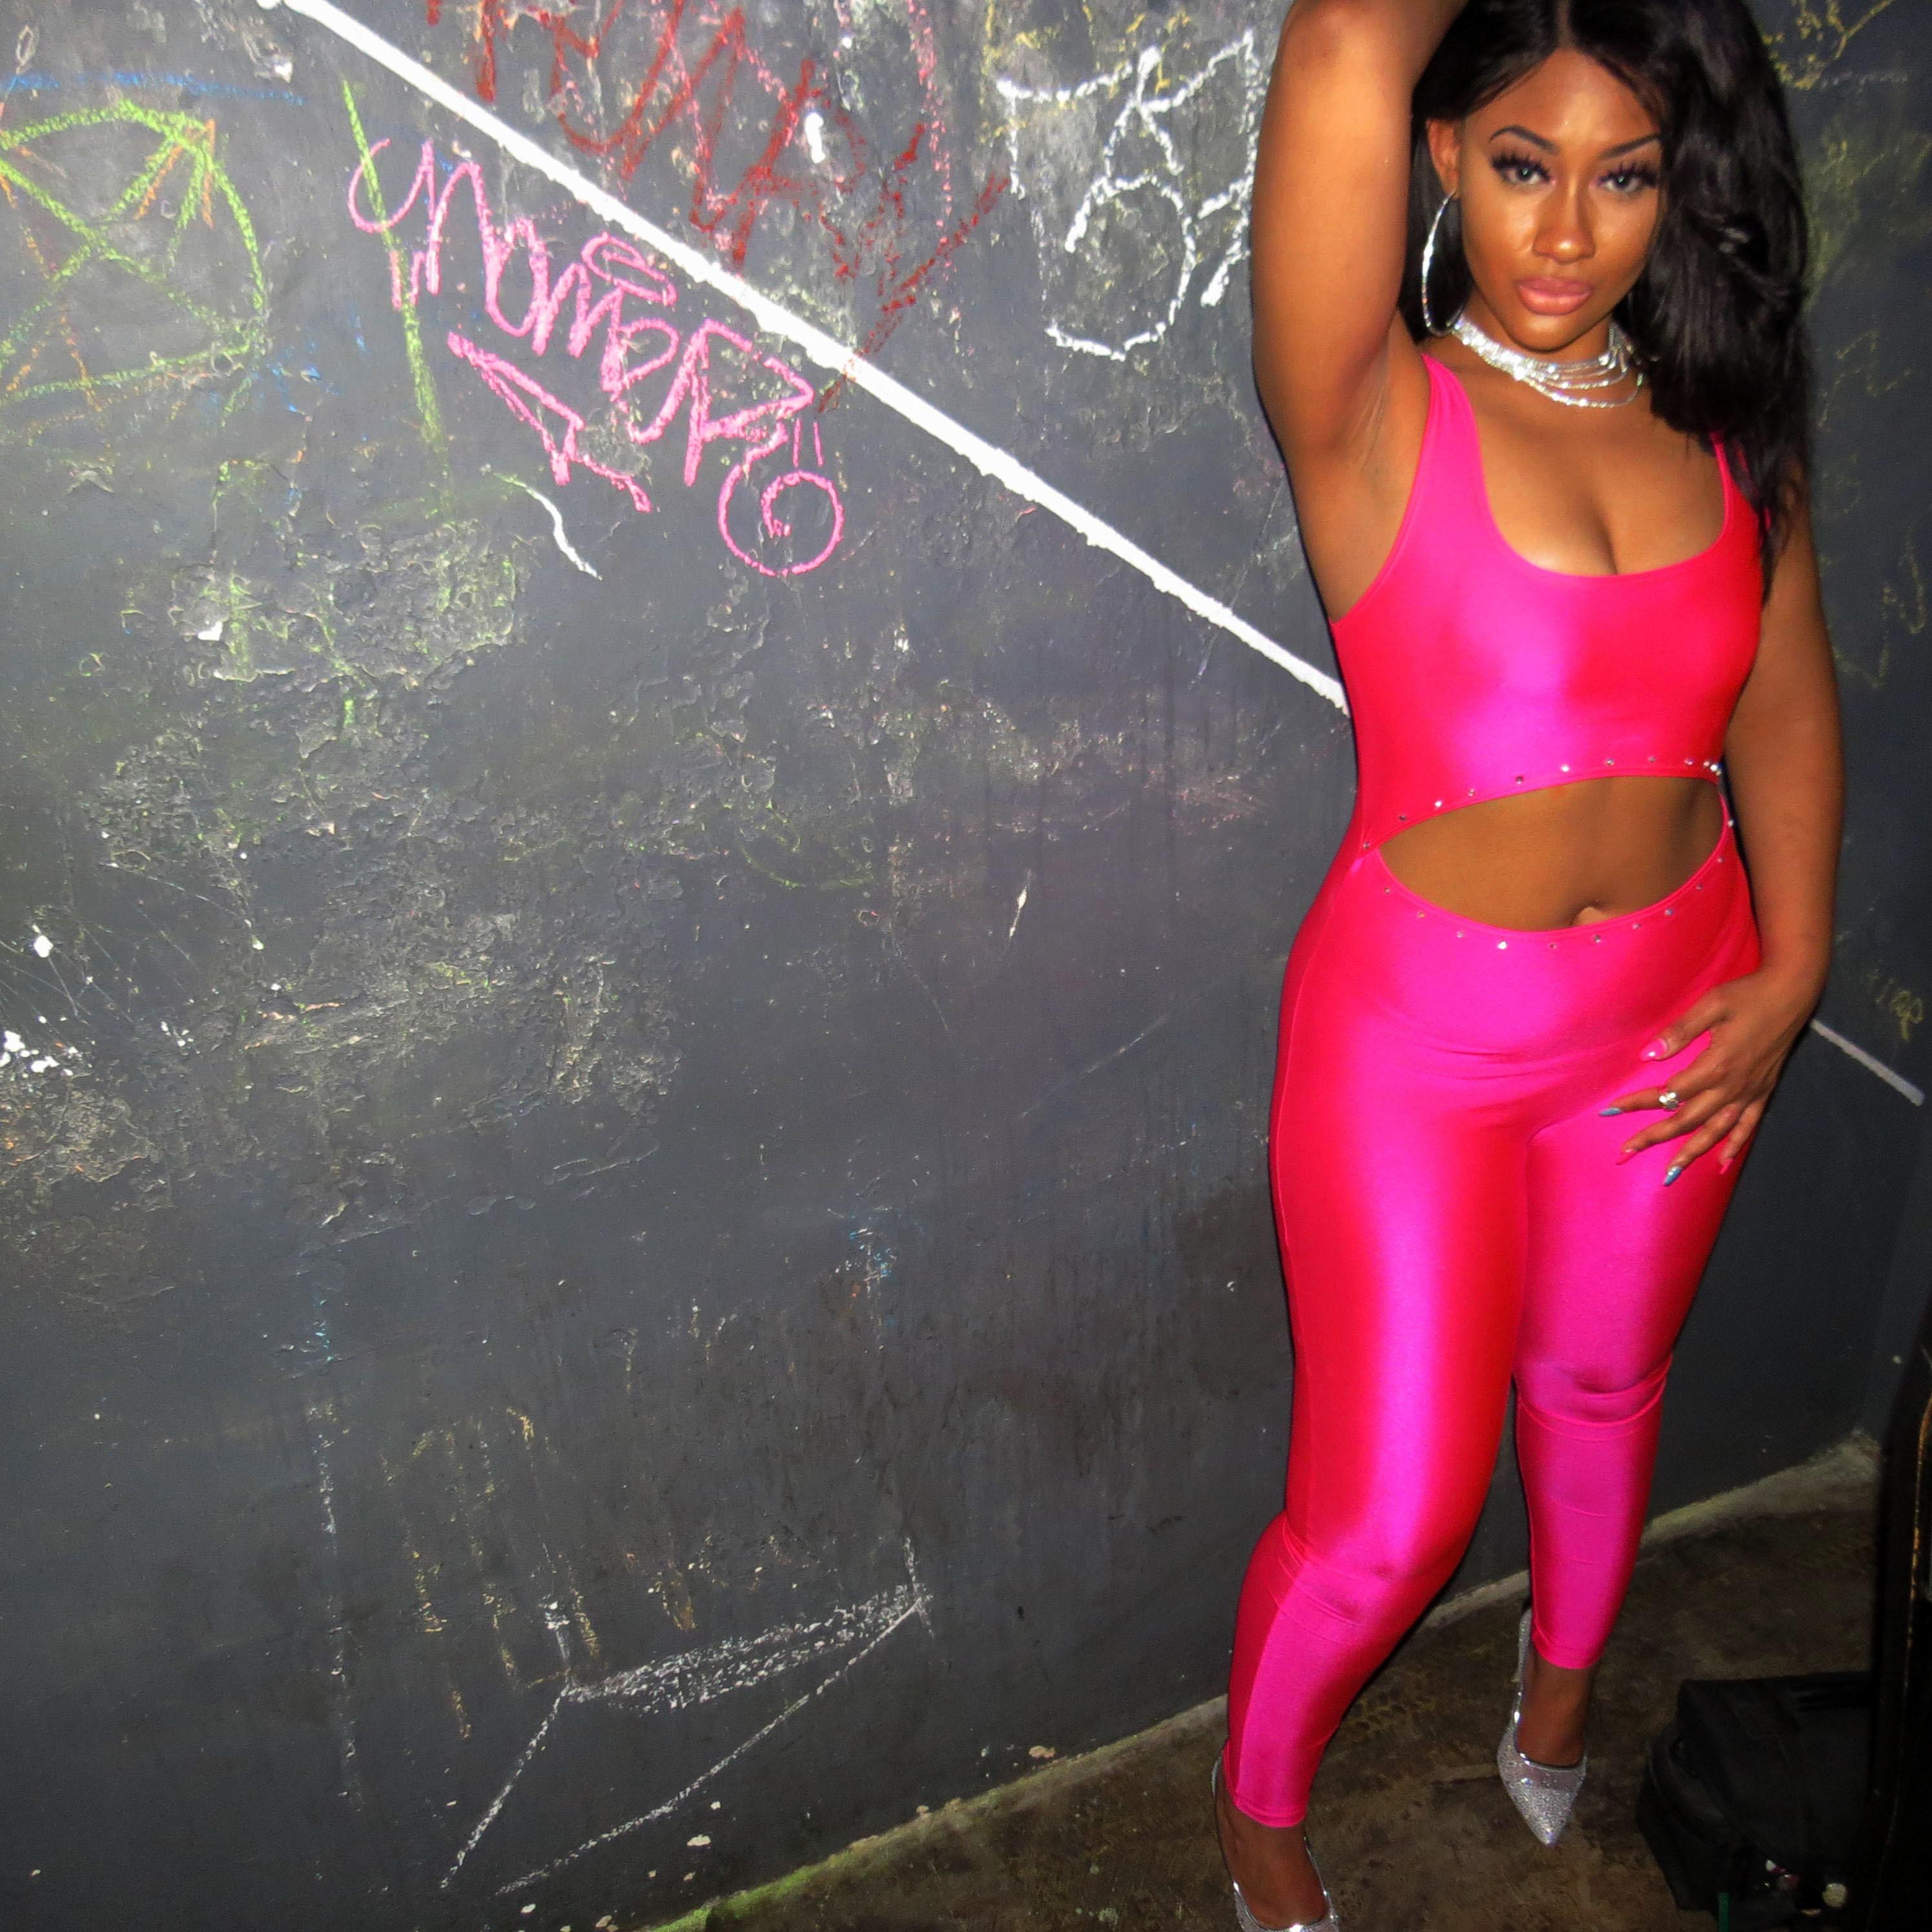 ec8aea585b9c Friday Night Pink Neon Jumpsuit. gallery photo gallery photo gallery photo  gallery photo ...